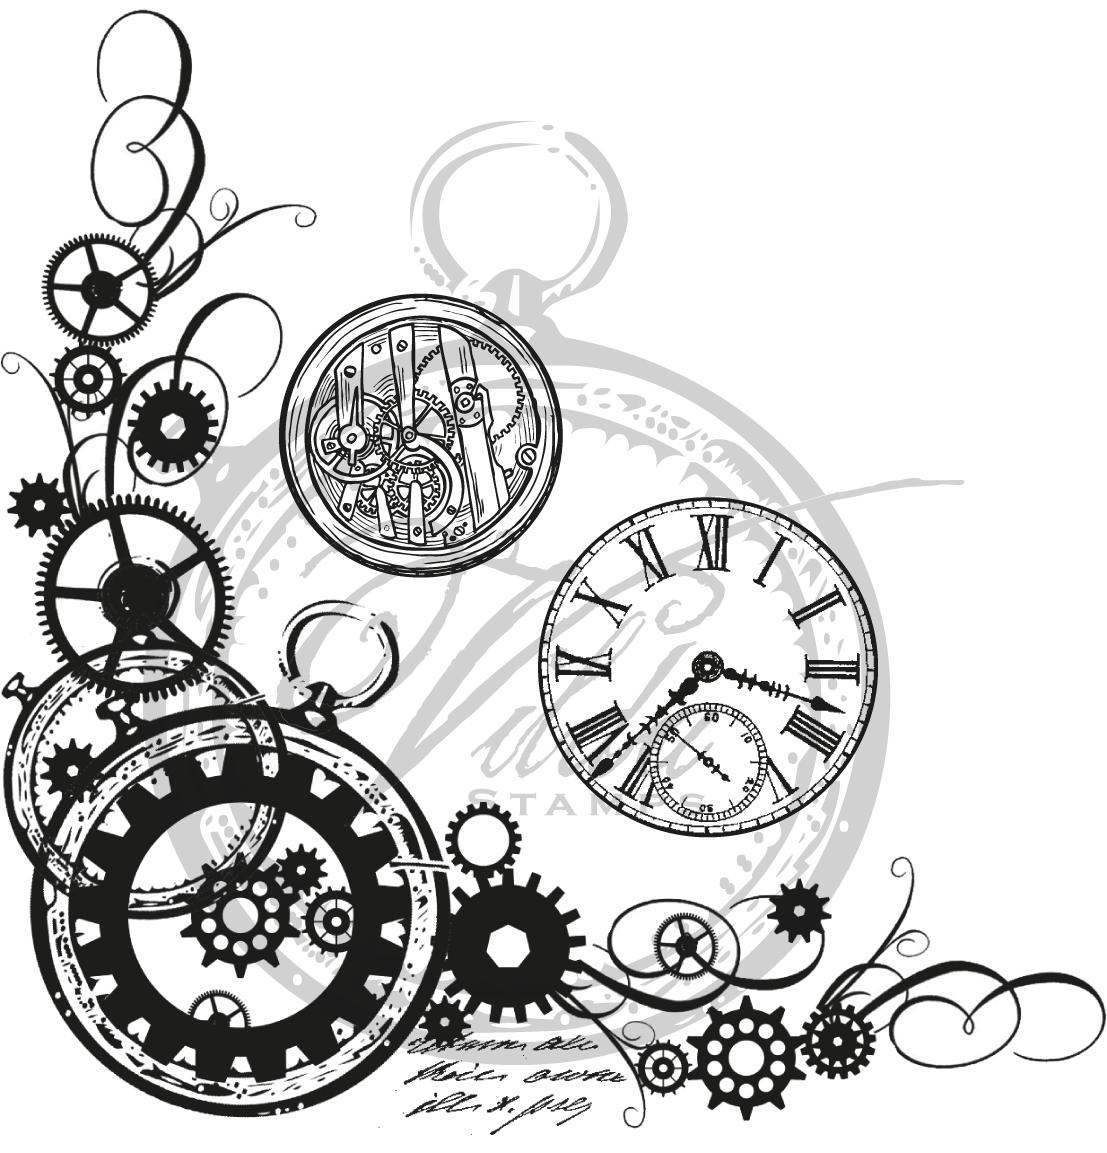 Clockwork Gears Drawing go Back Image